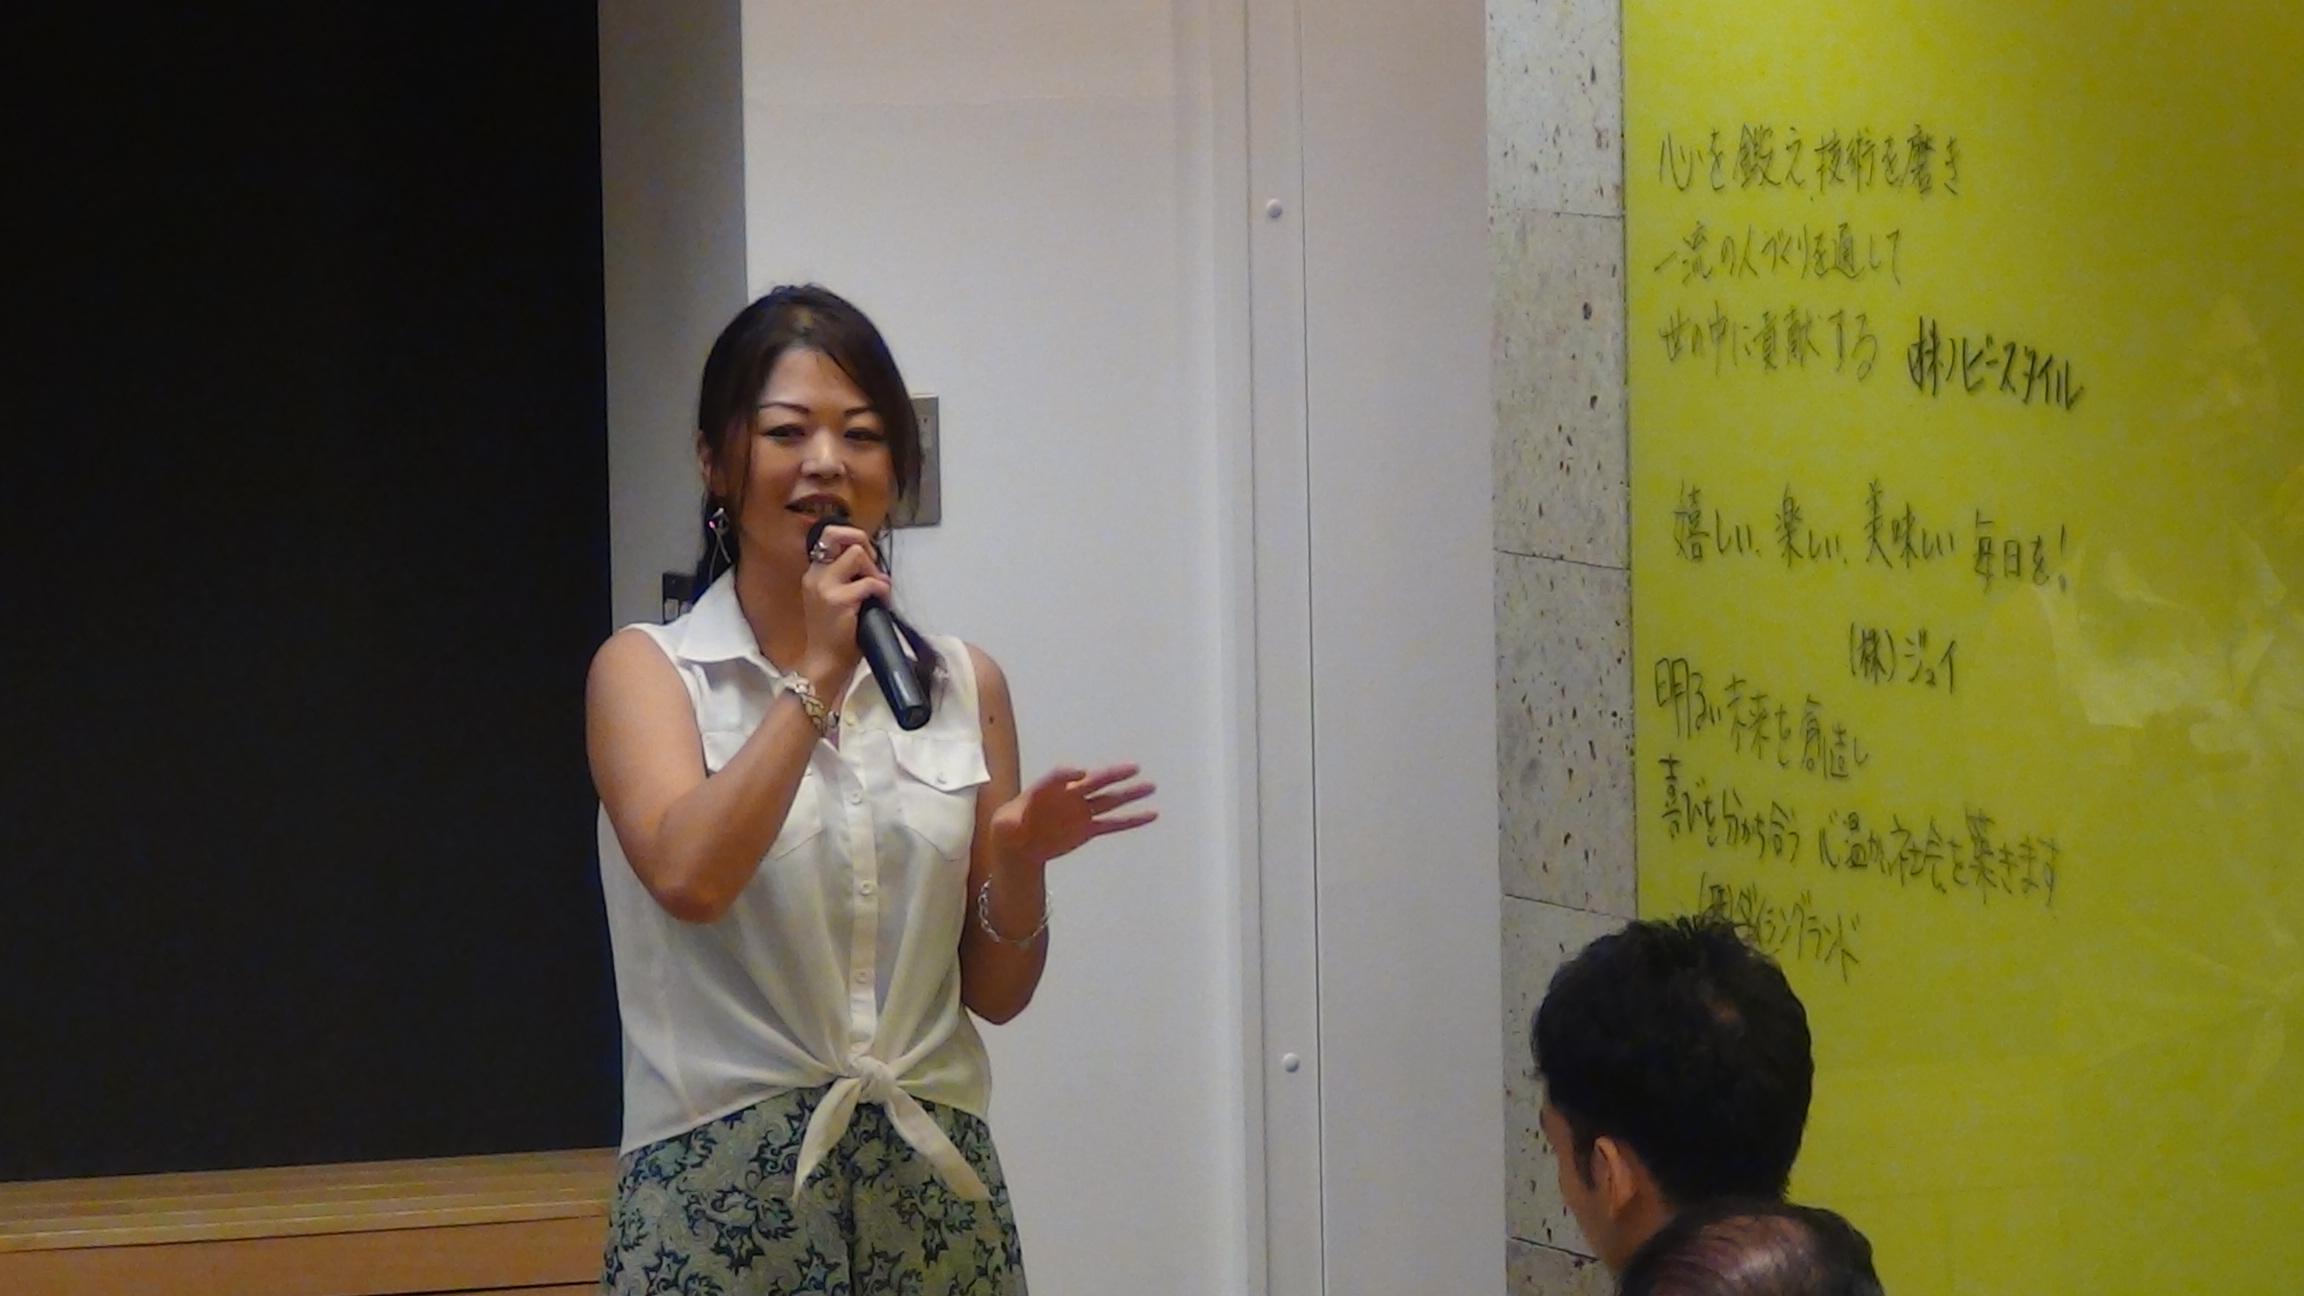 DSC00428 - 2017年8月5日東京思風塾「心が燃える理念とは〜自社の理念を問い直す〜」